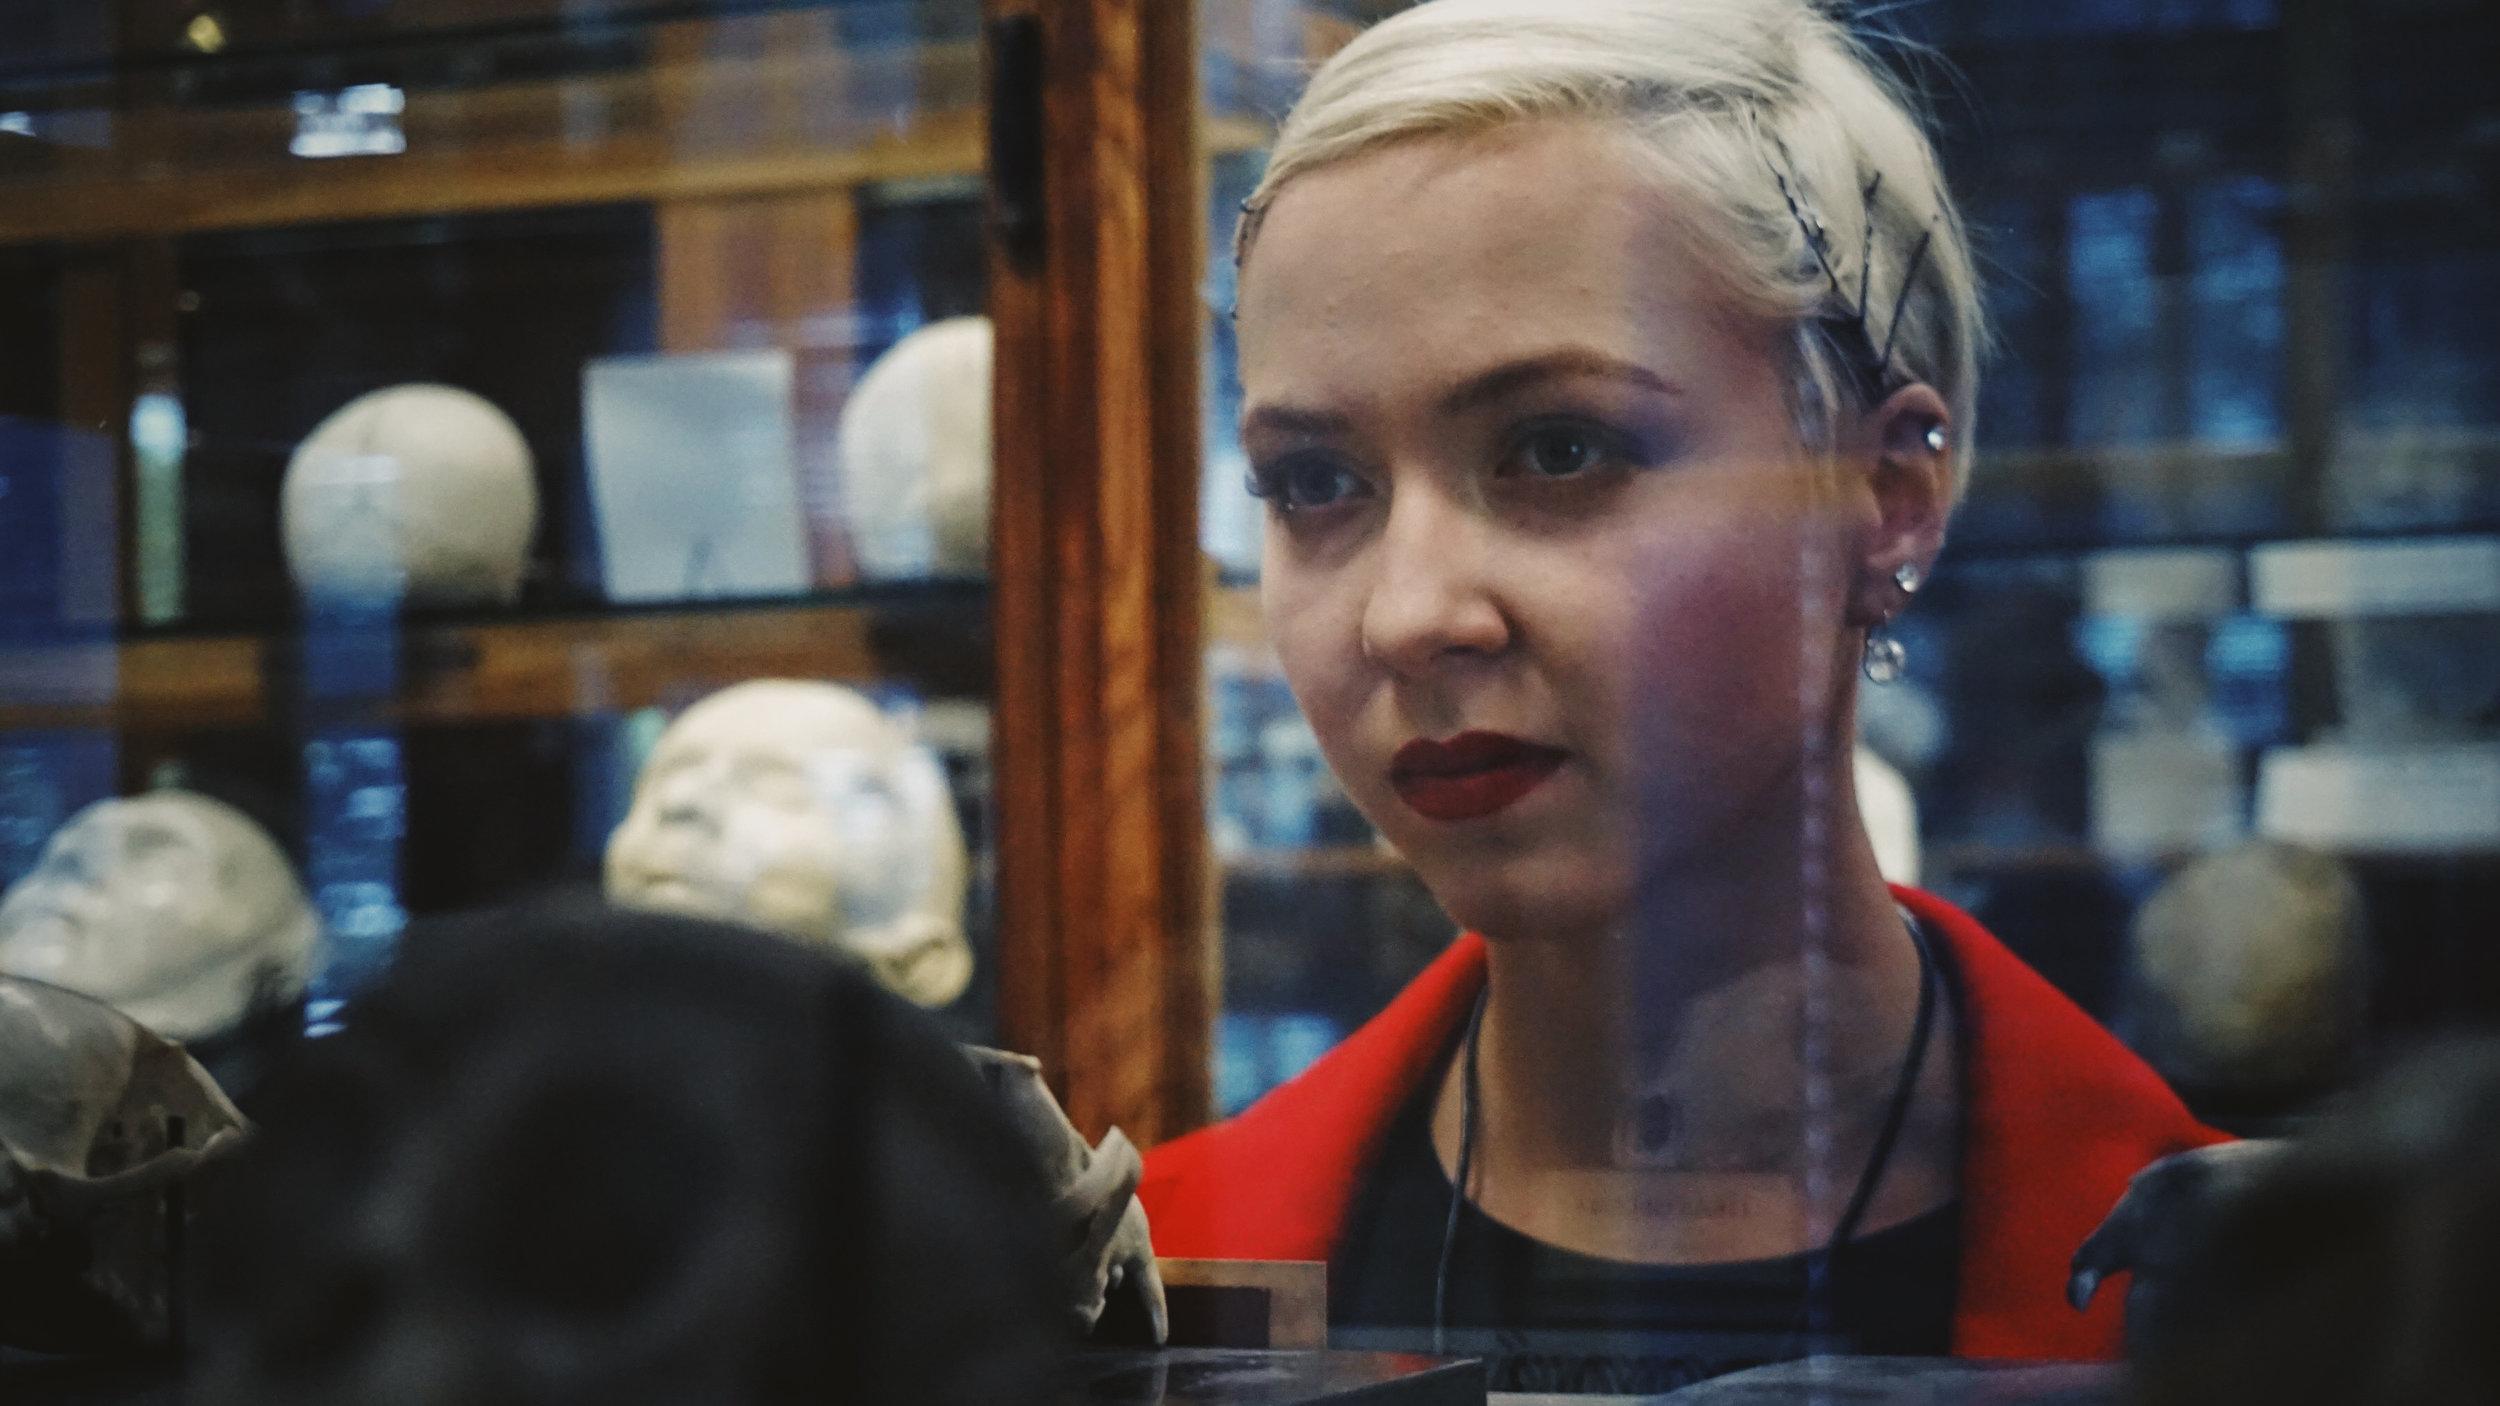 2018-Polina-Shubkina-Anastasia-Lagutina-Prague-Vampire-004.JPG